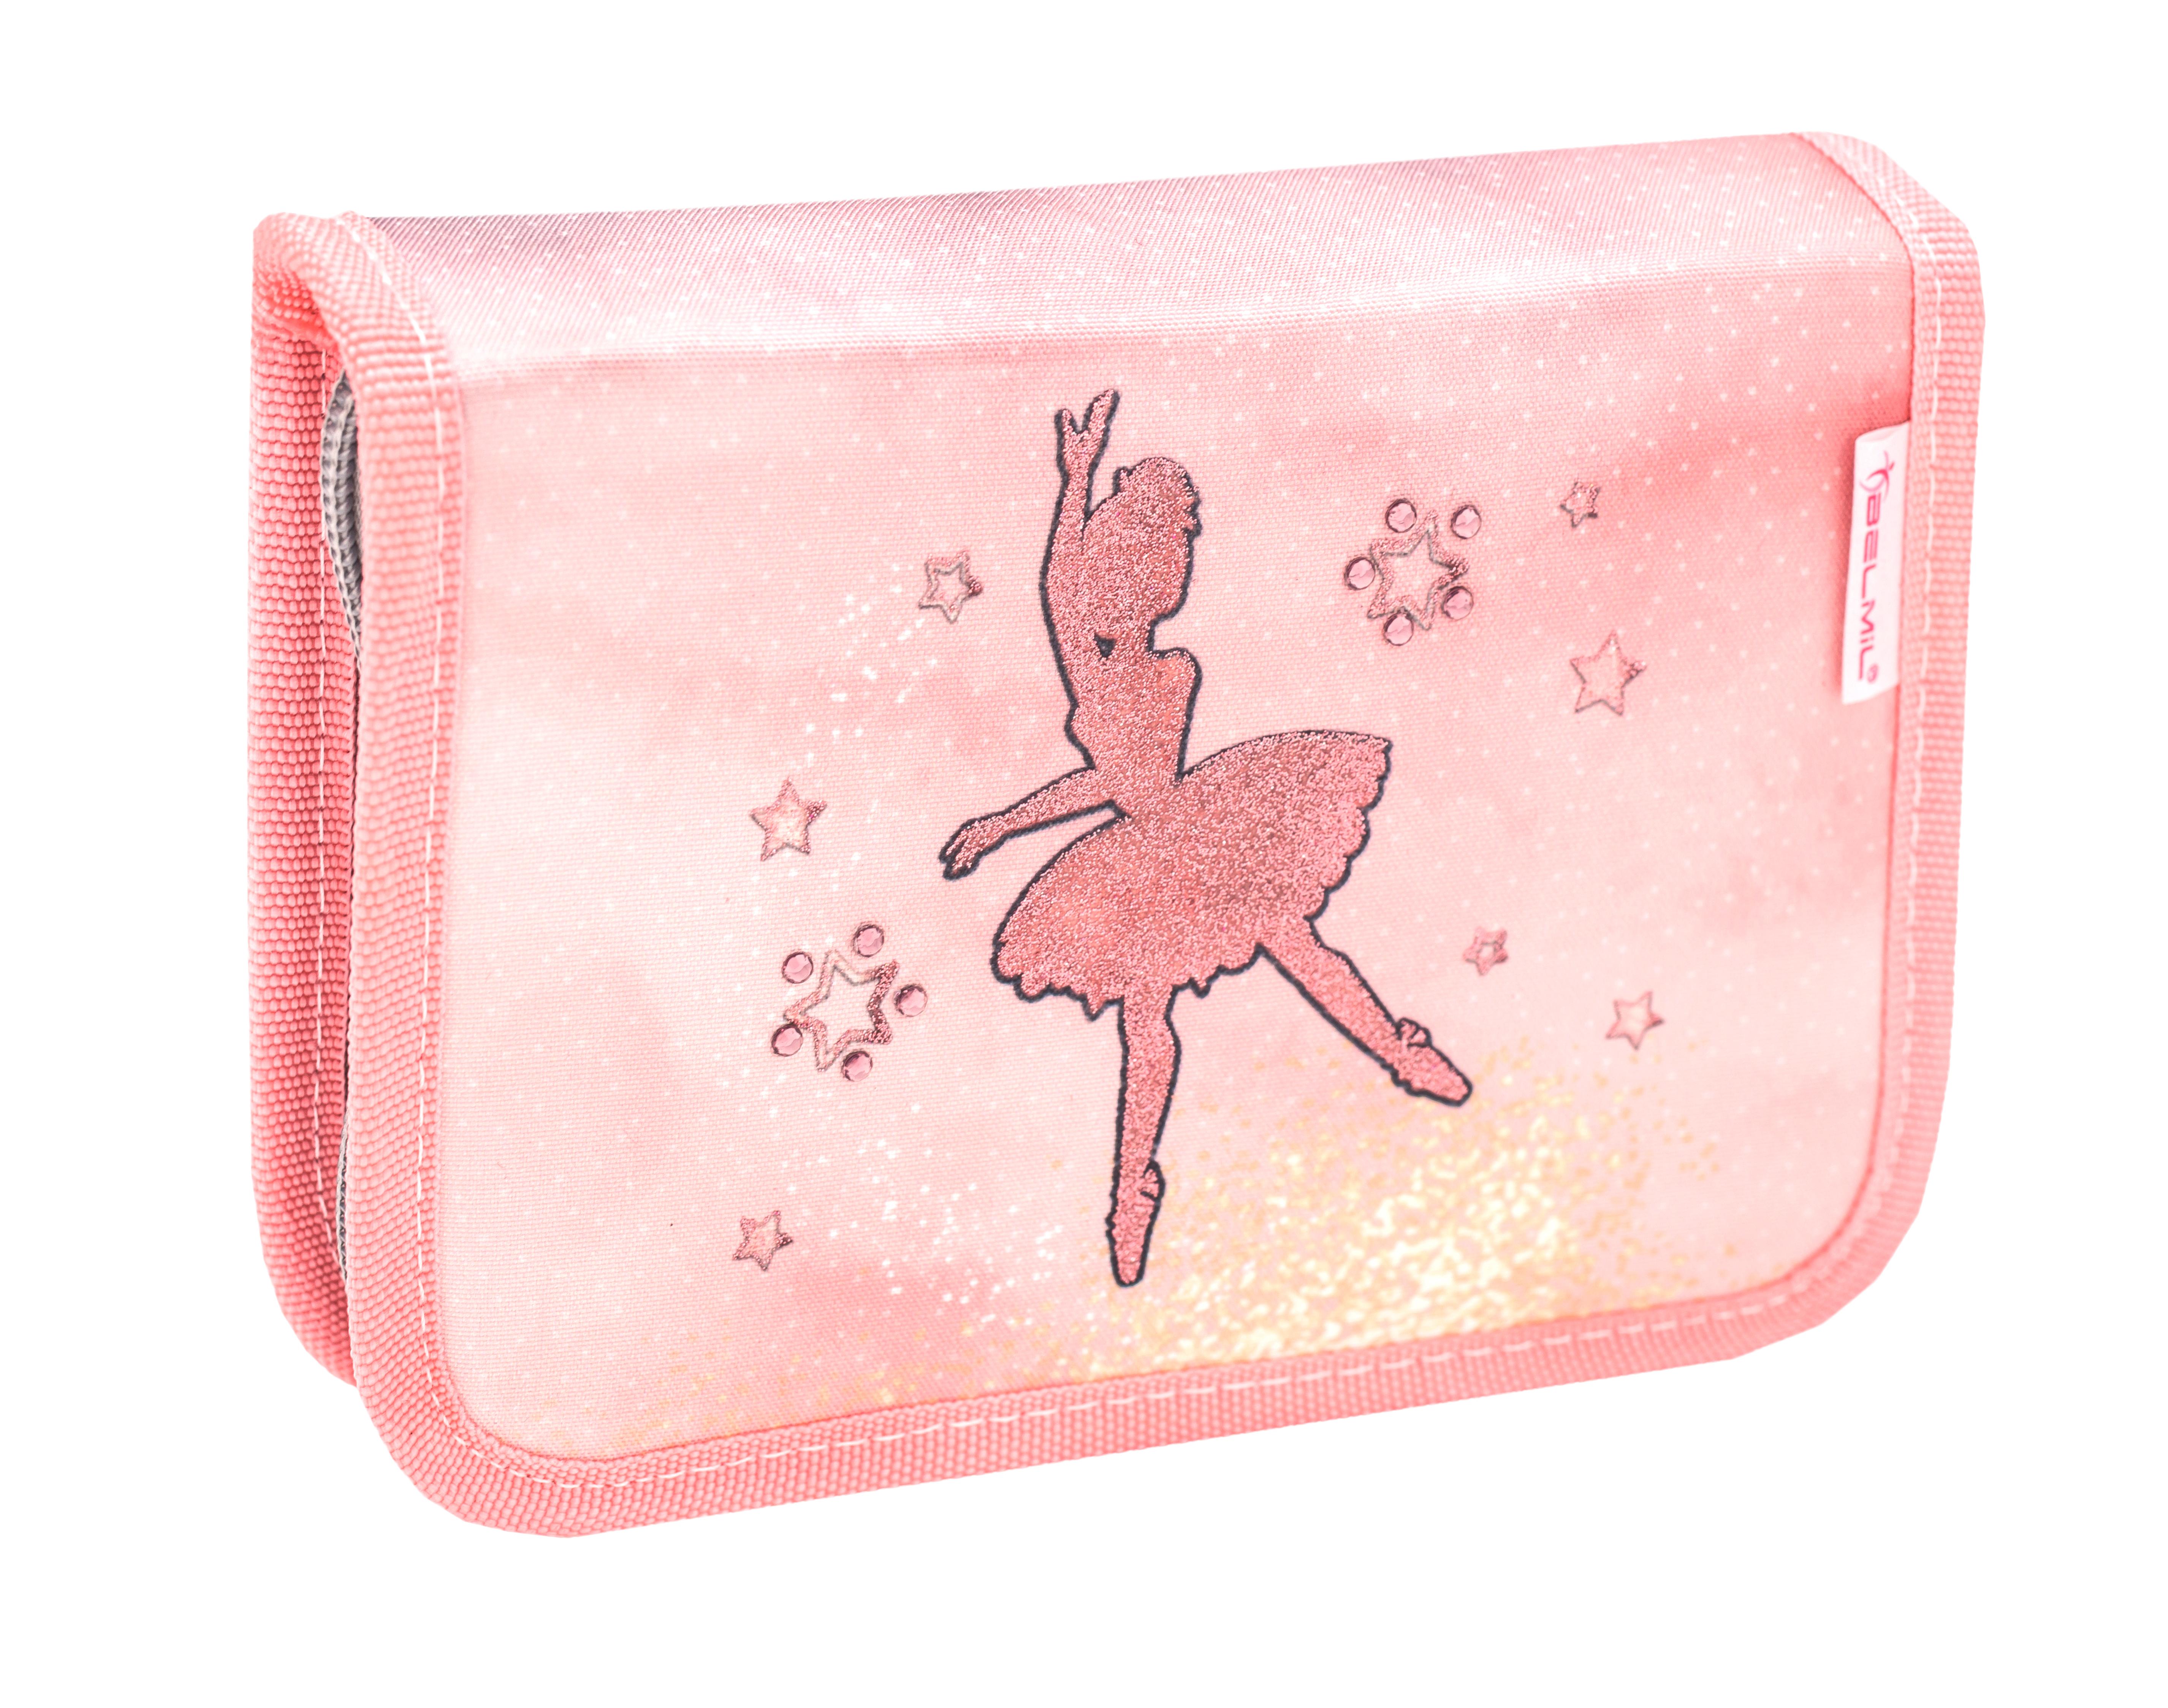 4-tlg. Schulranzenset Compact 19 Liter - Ballerina Black Pink